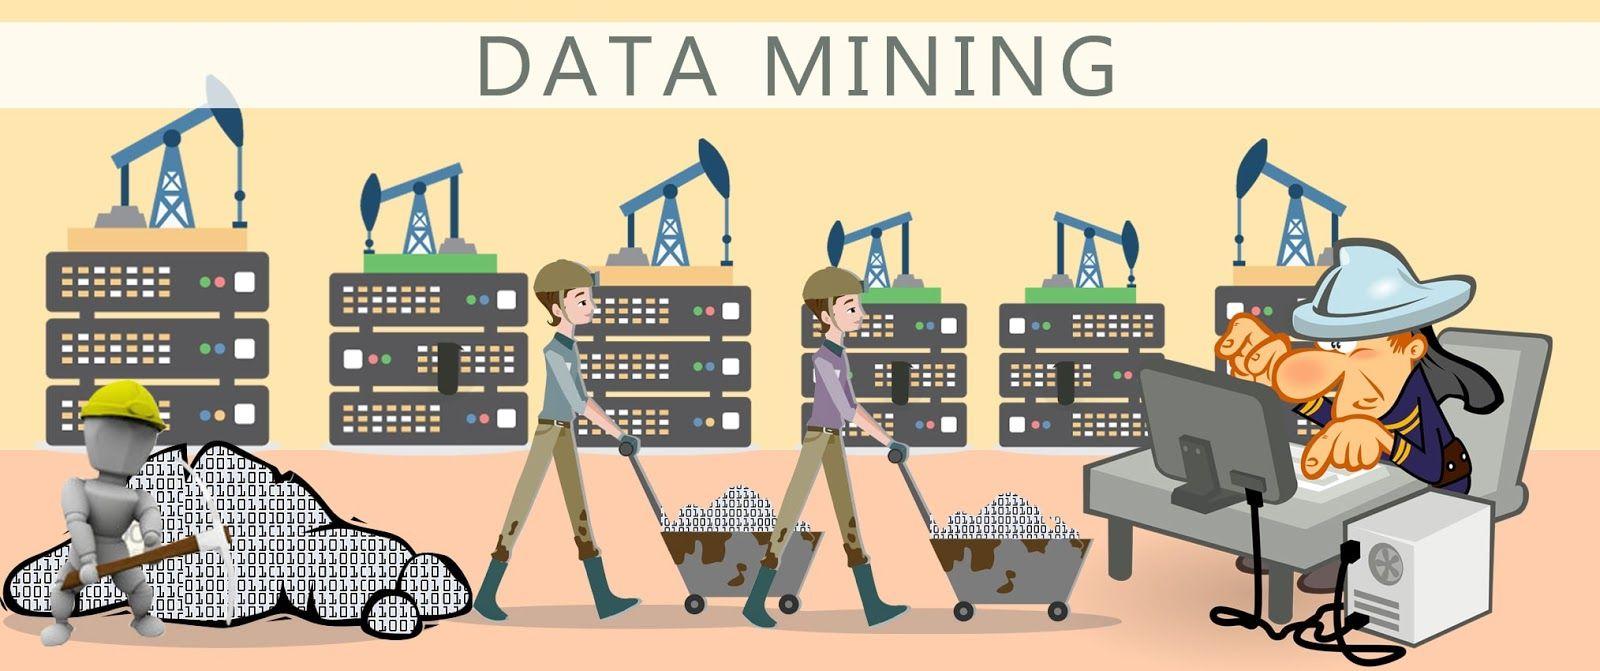 1 Data Mining Jobs in New Delhi February 2020 Data